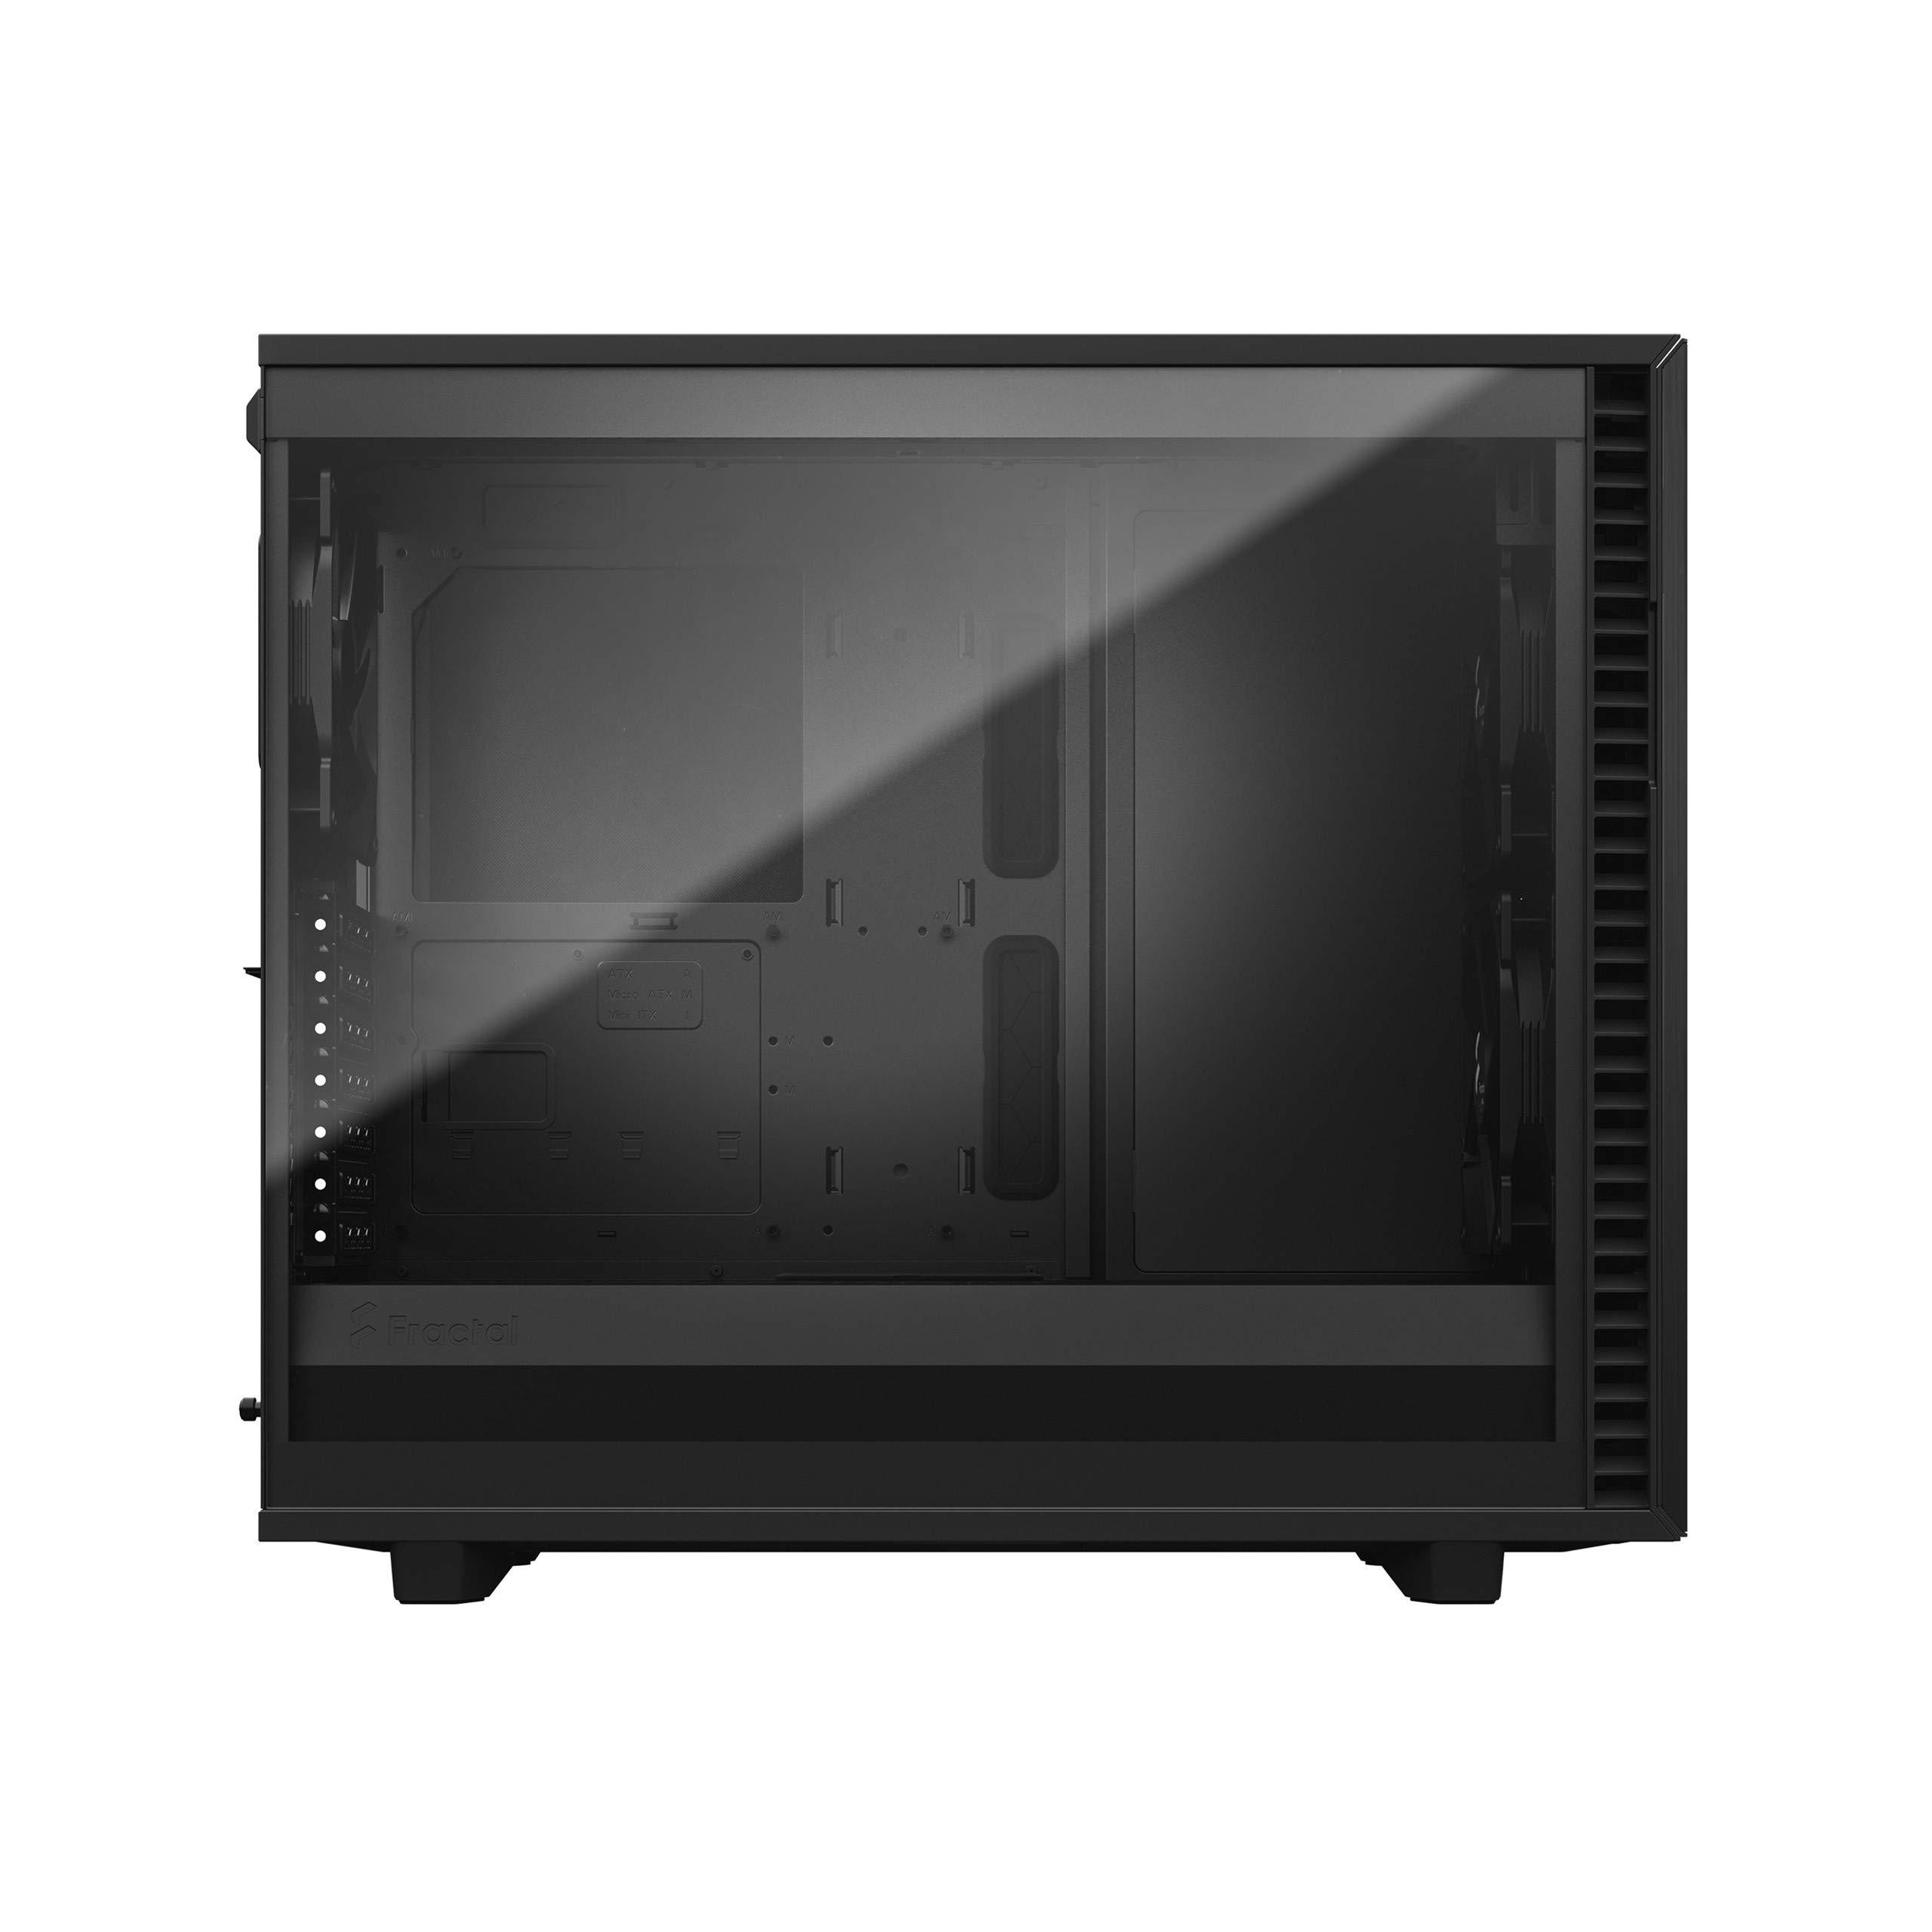 Fractal Design Define 7 Gris - Aluminio Cepillado/Acero - Panel Lateral de Vidrio Templado y teñido - Interior Modular E-ATX - Mid Tower Carcasa de Ordenador: Amazon.es: Informática